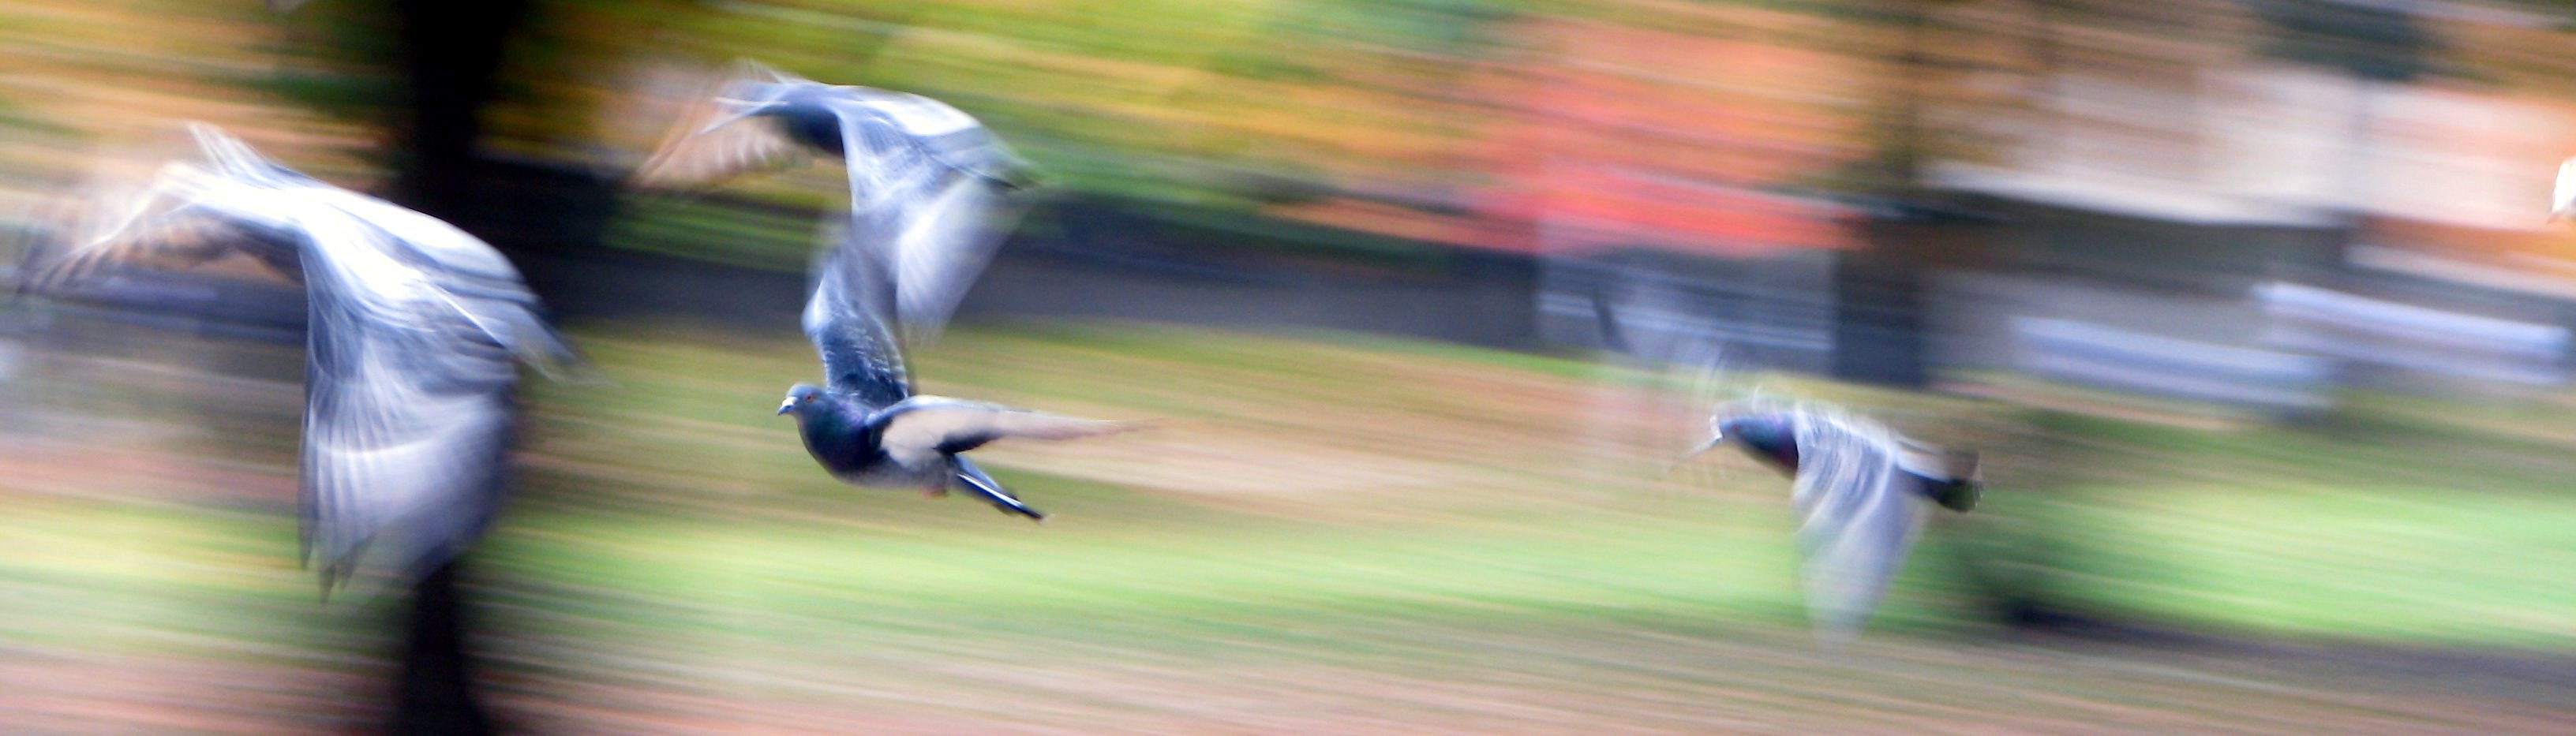 startled birds take flight in autumn